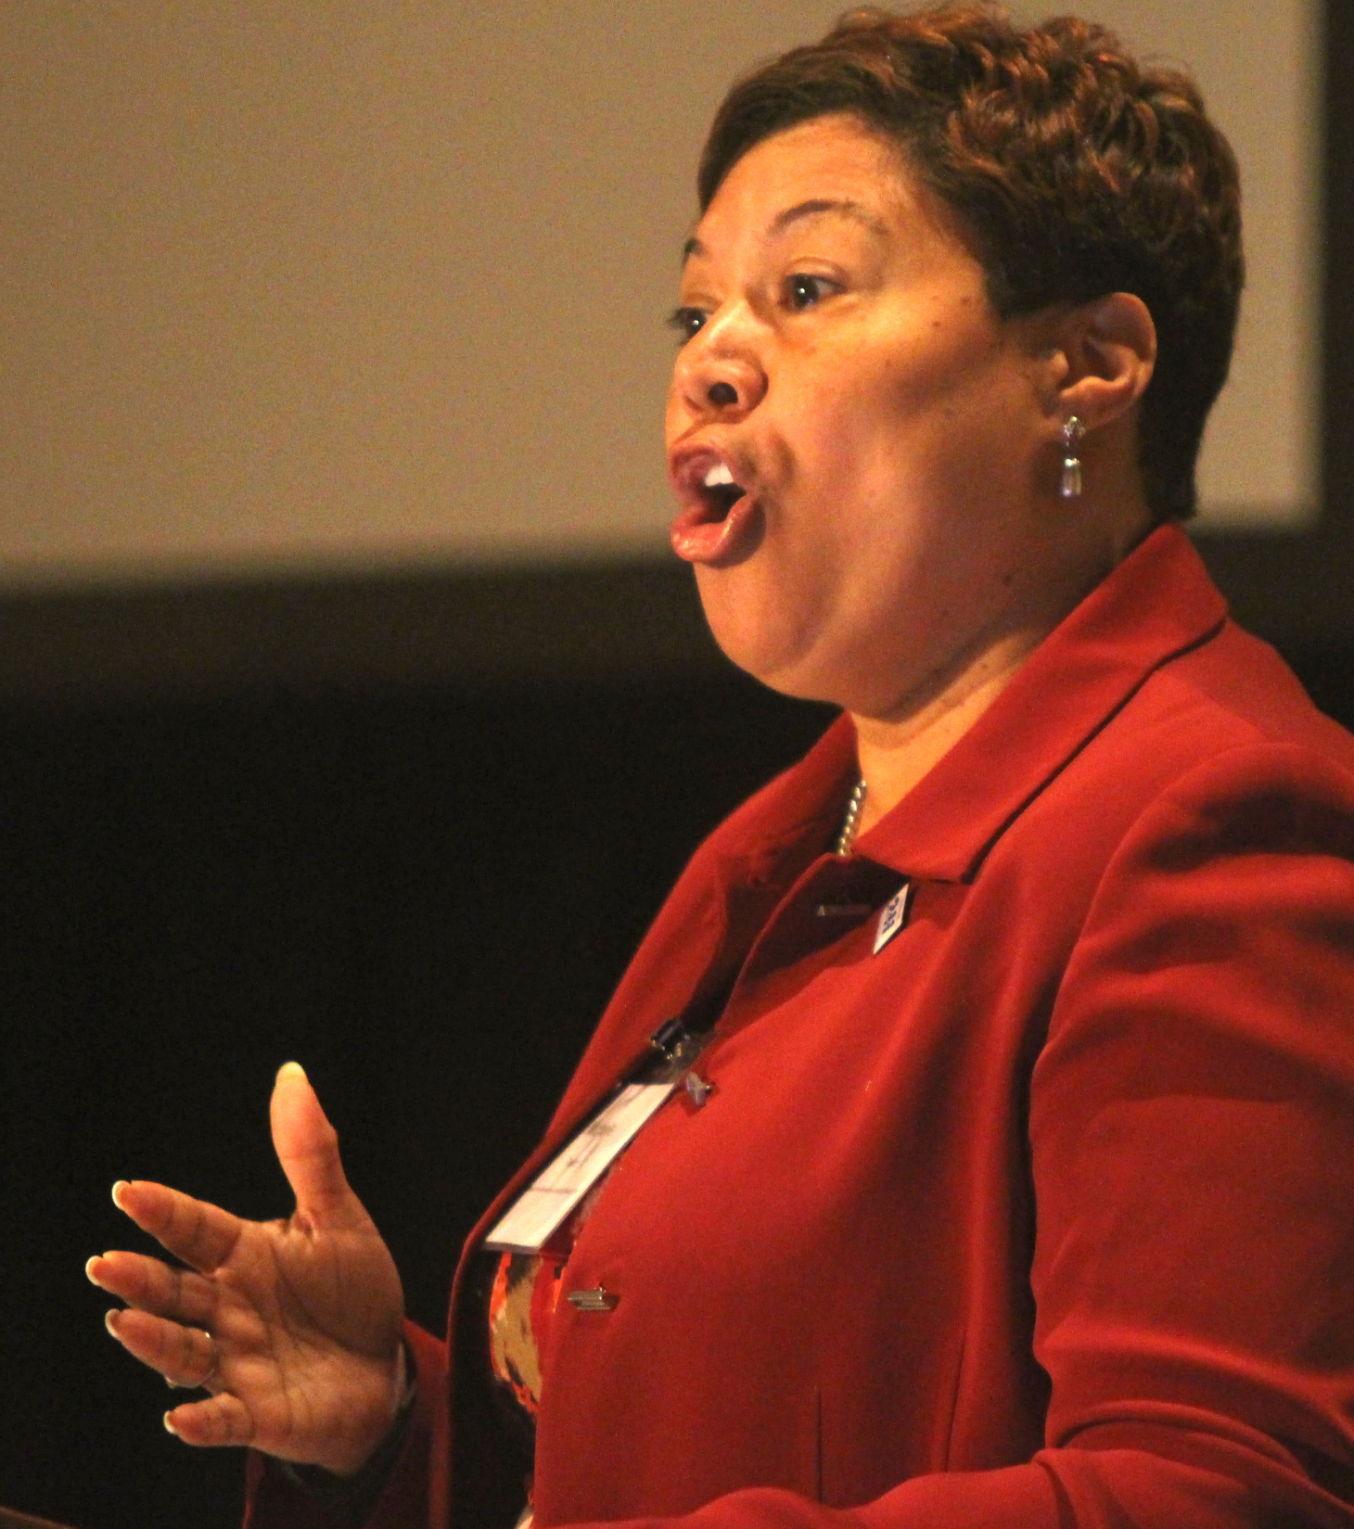 Greater Newark Area Resource Summit